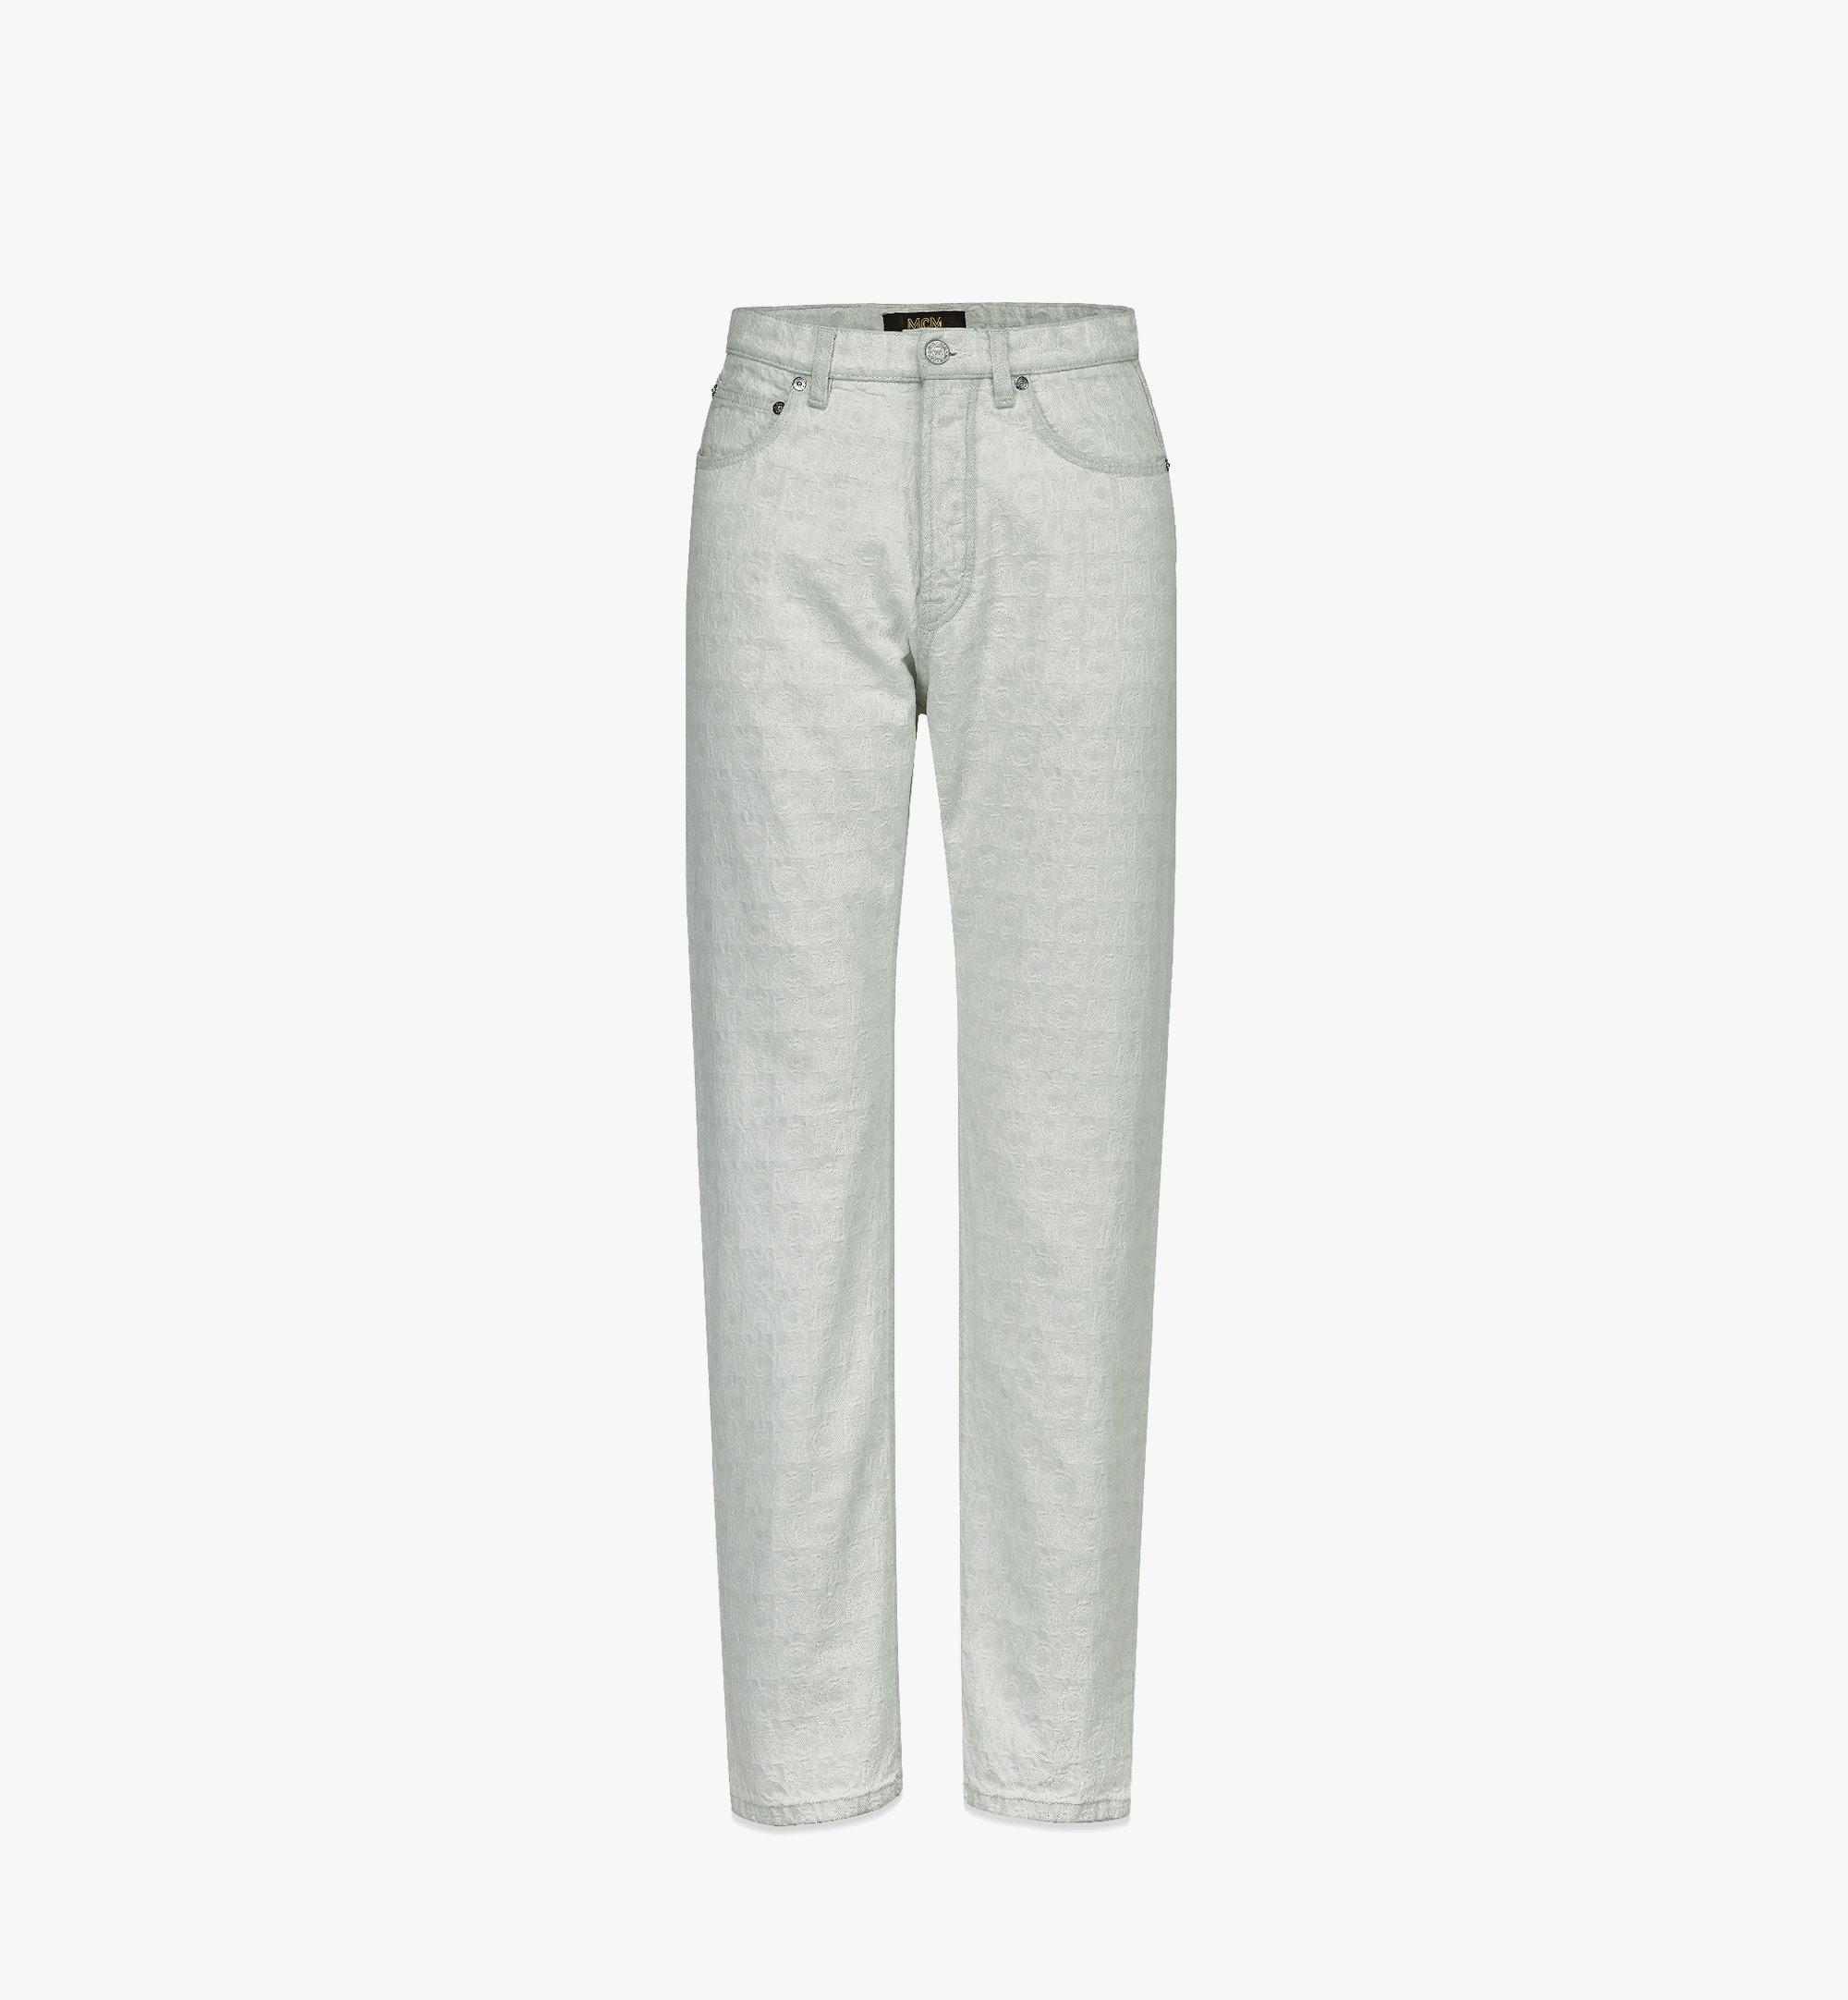 MCM Men's Monogram Straight-Leg Denim Jeans White MHPBSMM03WO050 Alternate View 1